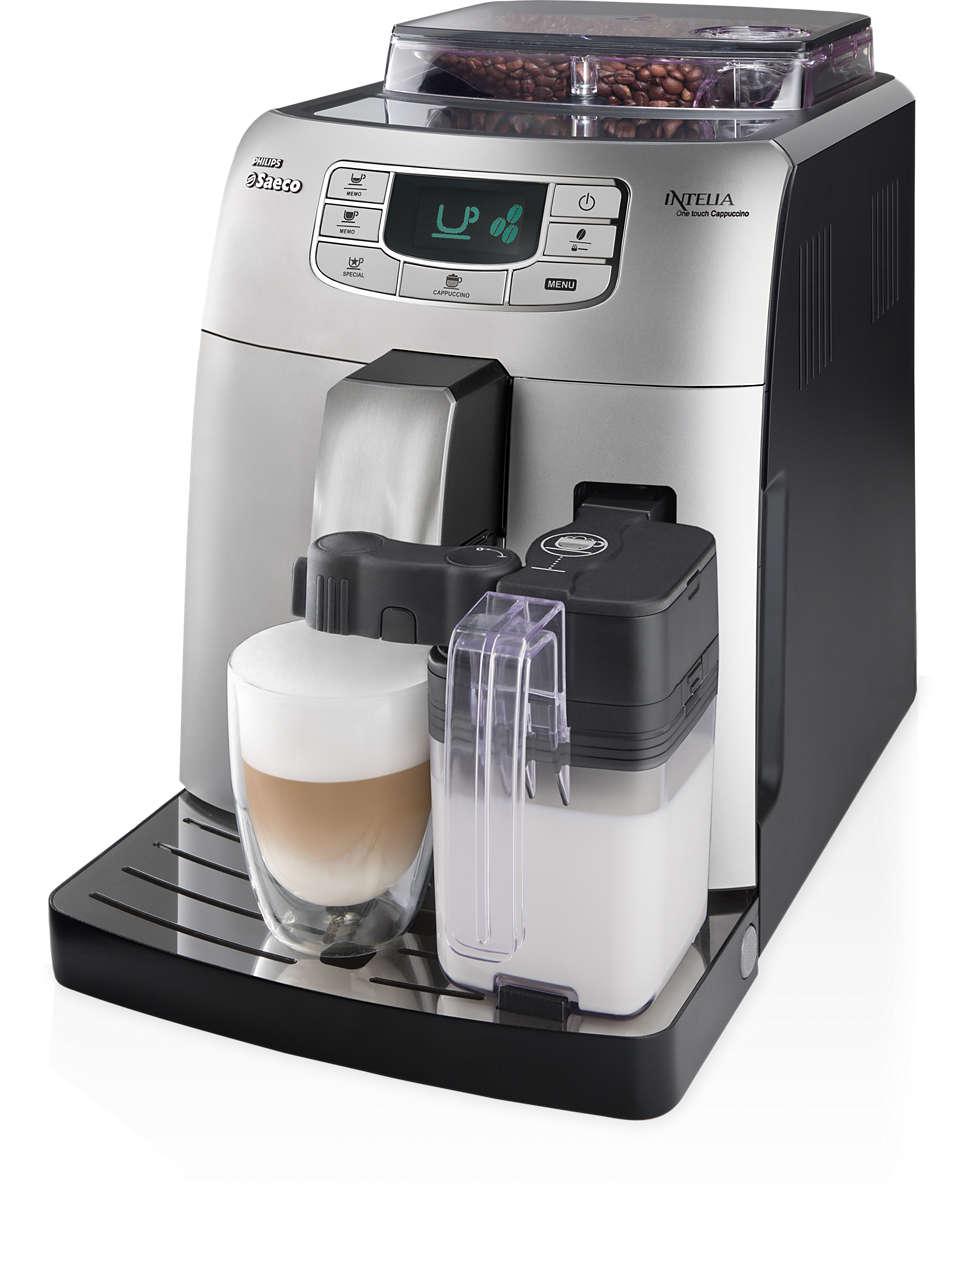 One-touch Espresso and Cappuccino